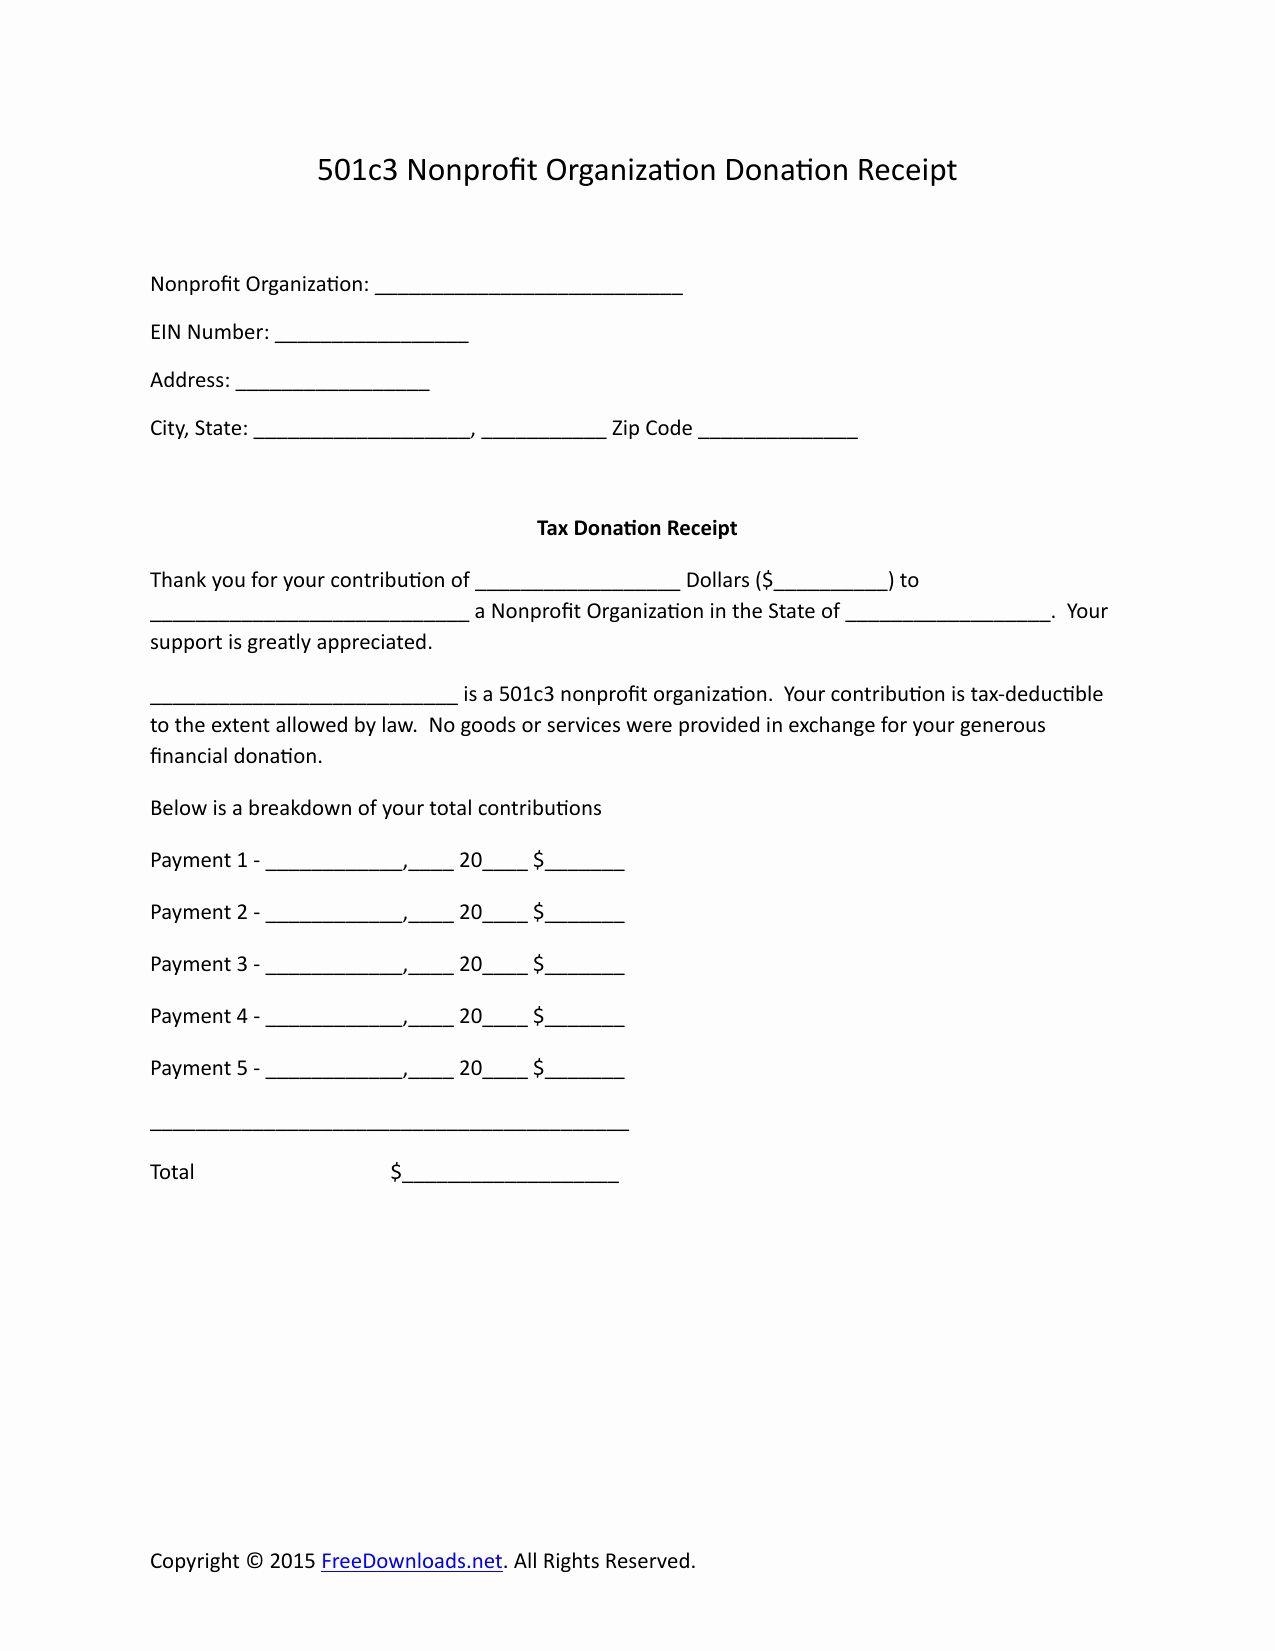 Donation Receipt Letter Template Beautiful Download 501c3 Donation Receipt Letter For Tax Purposes Donation Letter Template Donation Letter Receipt Template